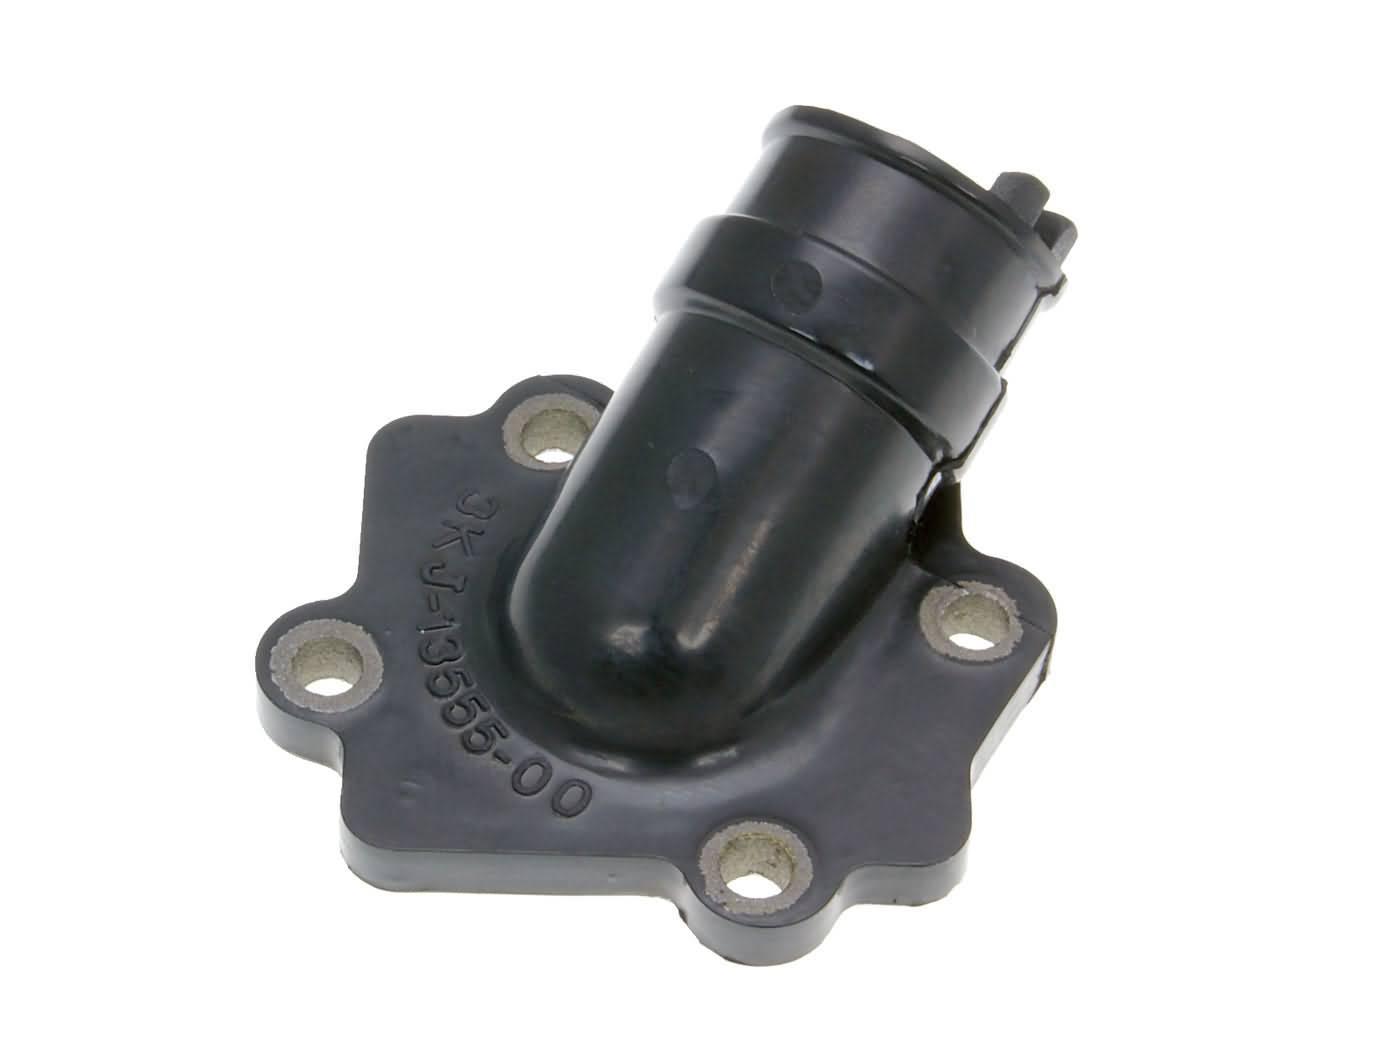 07- CPI Motor Vergaser ungedrosselt f/ür Malaguti F12 Phantom 50 AC